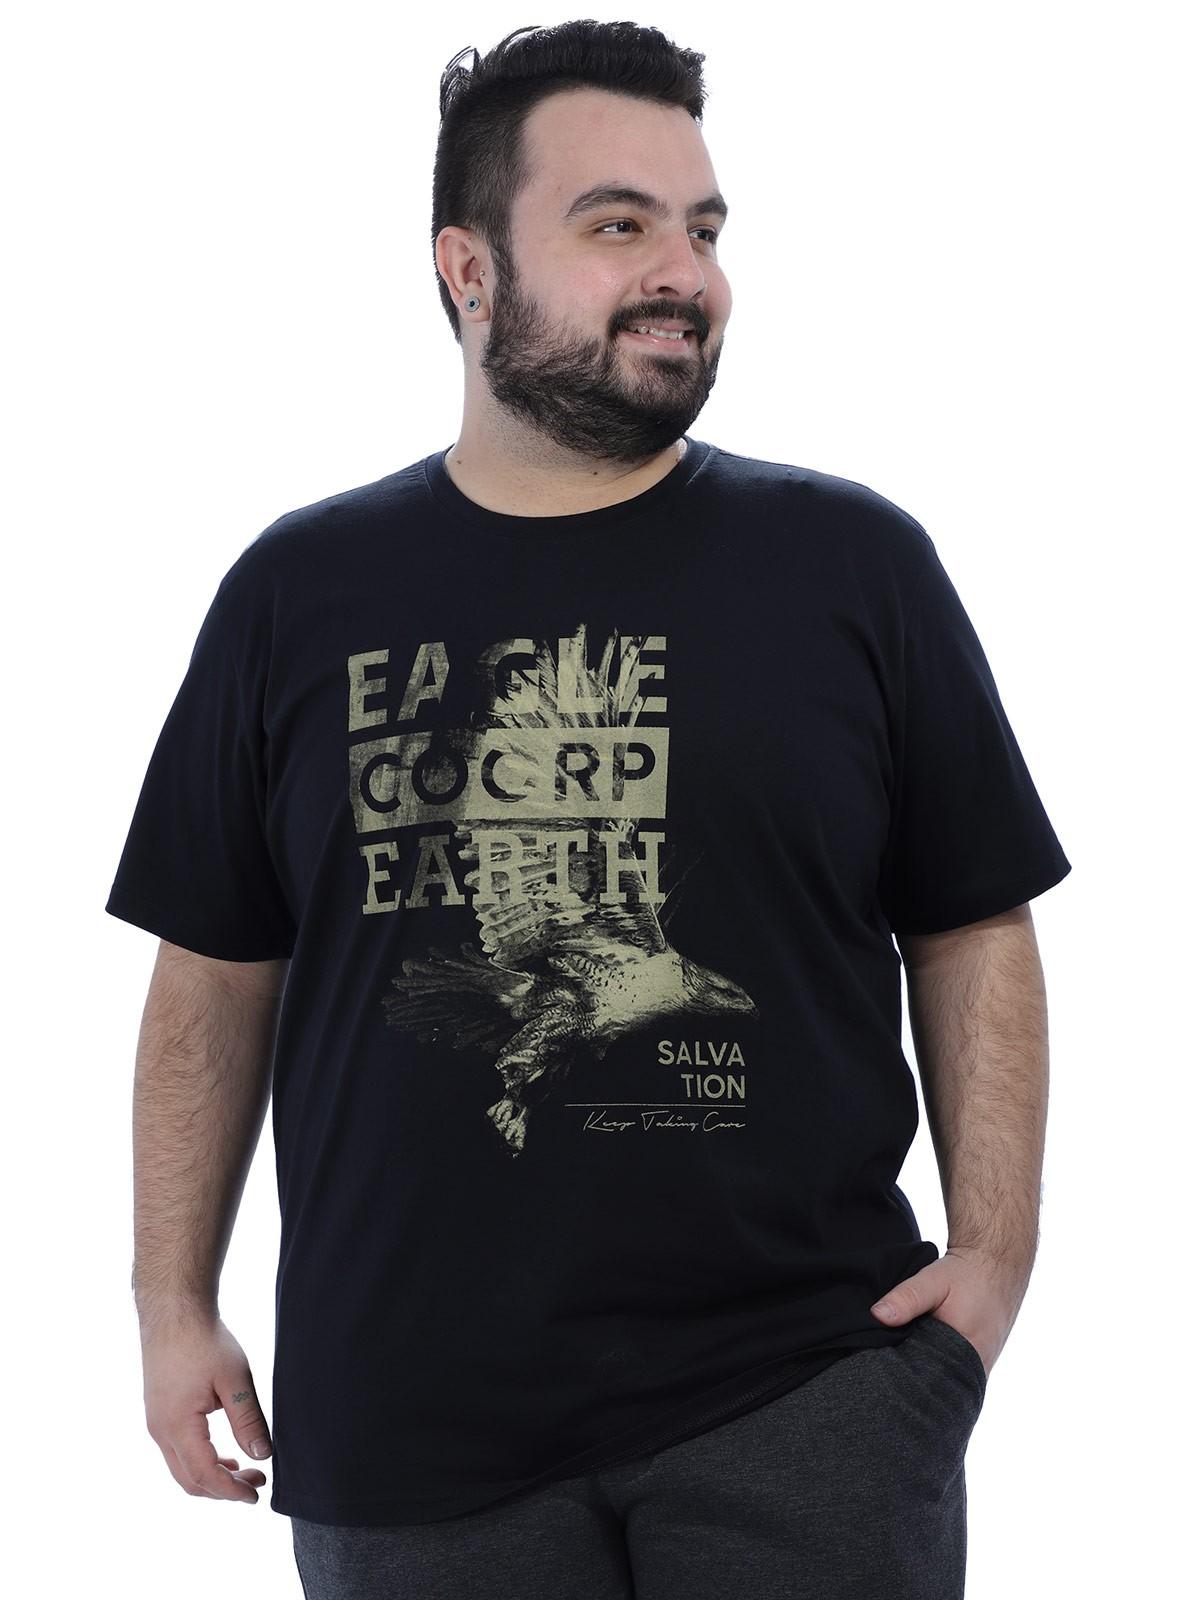 Camiseta Plus Size Masculino Eagle Anistia Preta